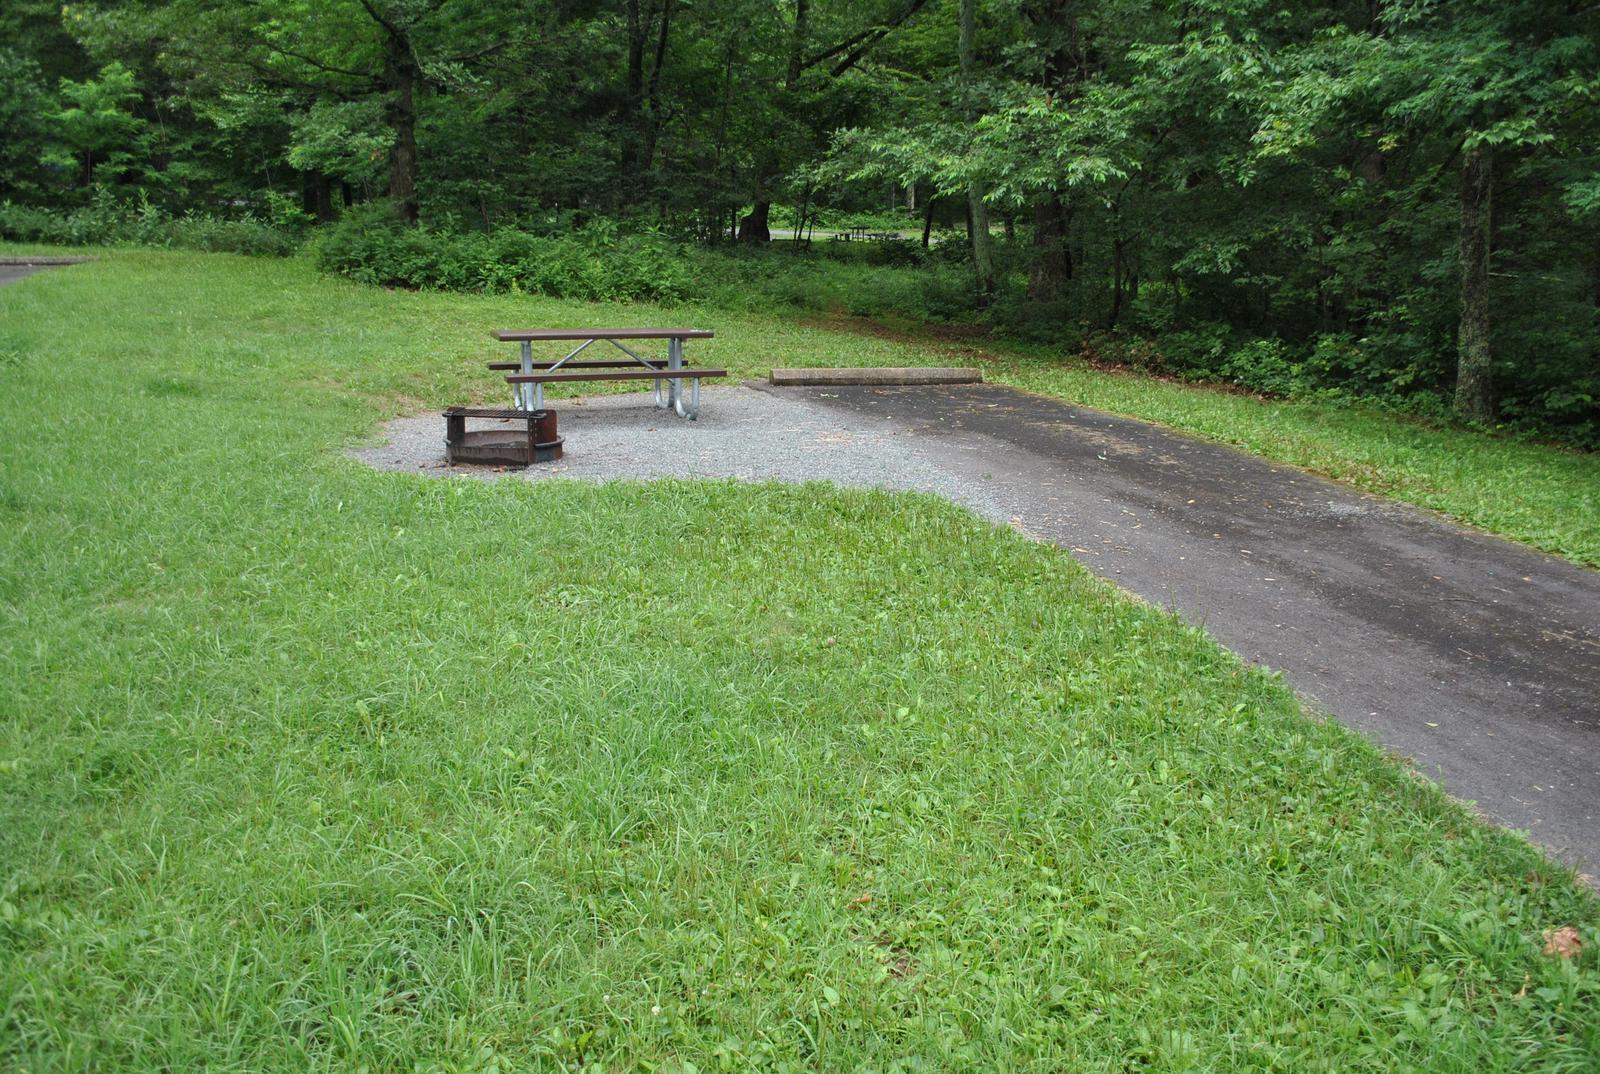 Mathews Arm Campground – Site A105